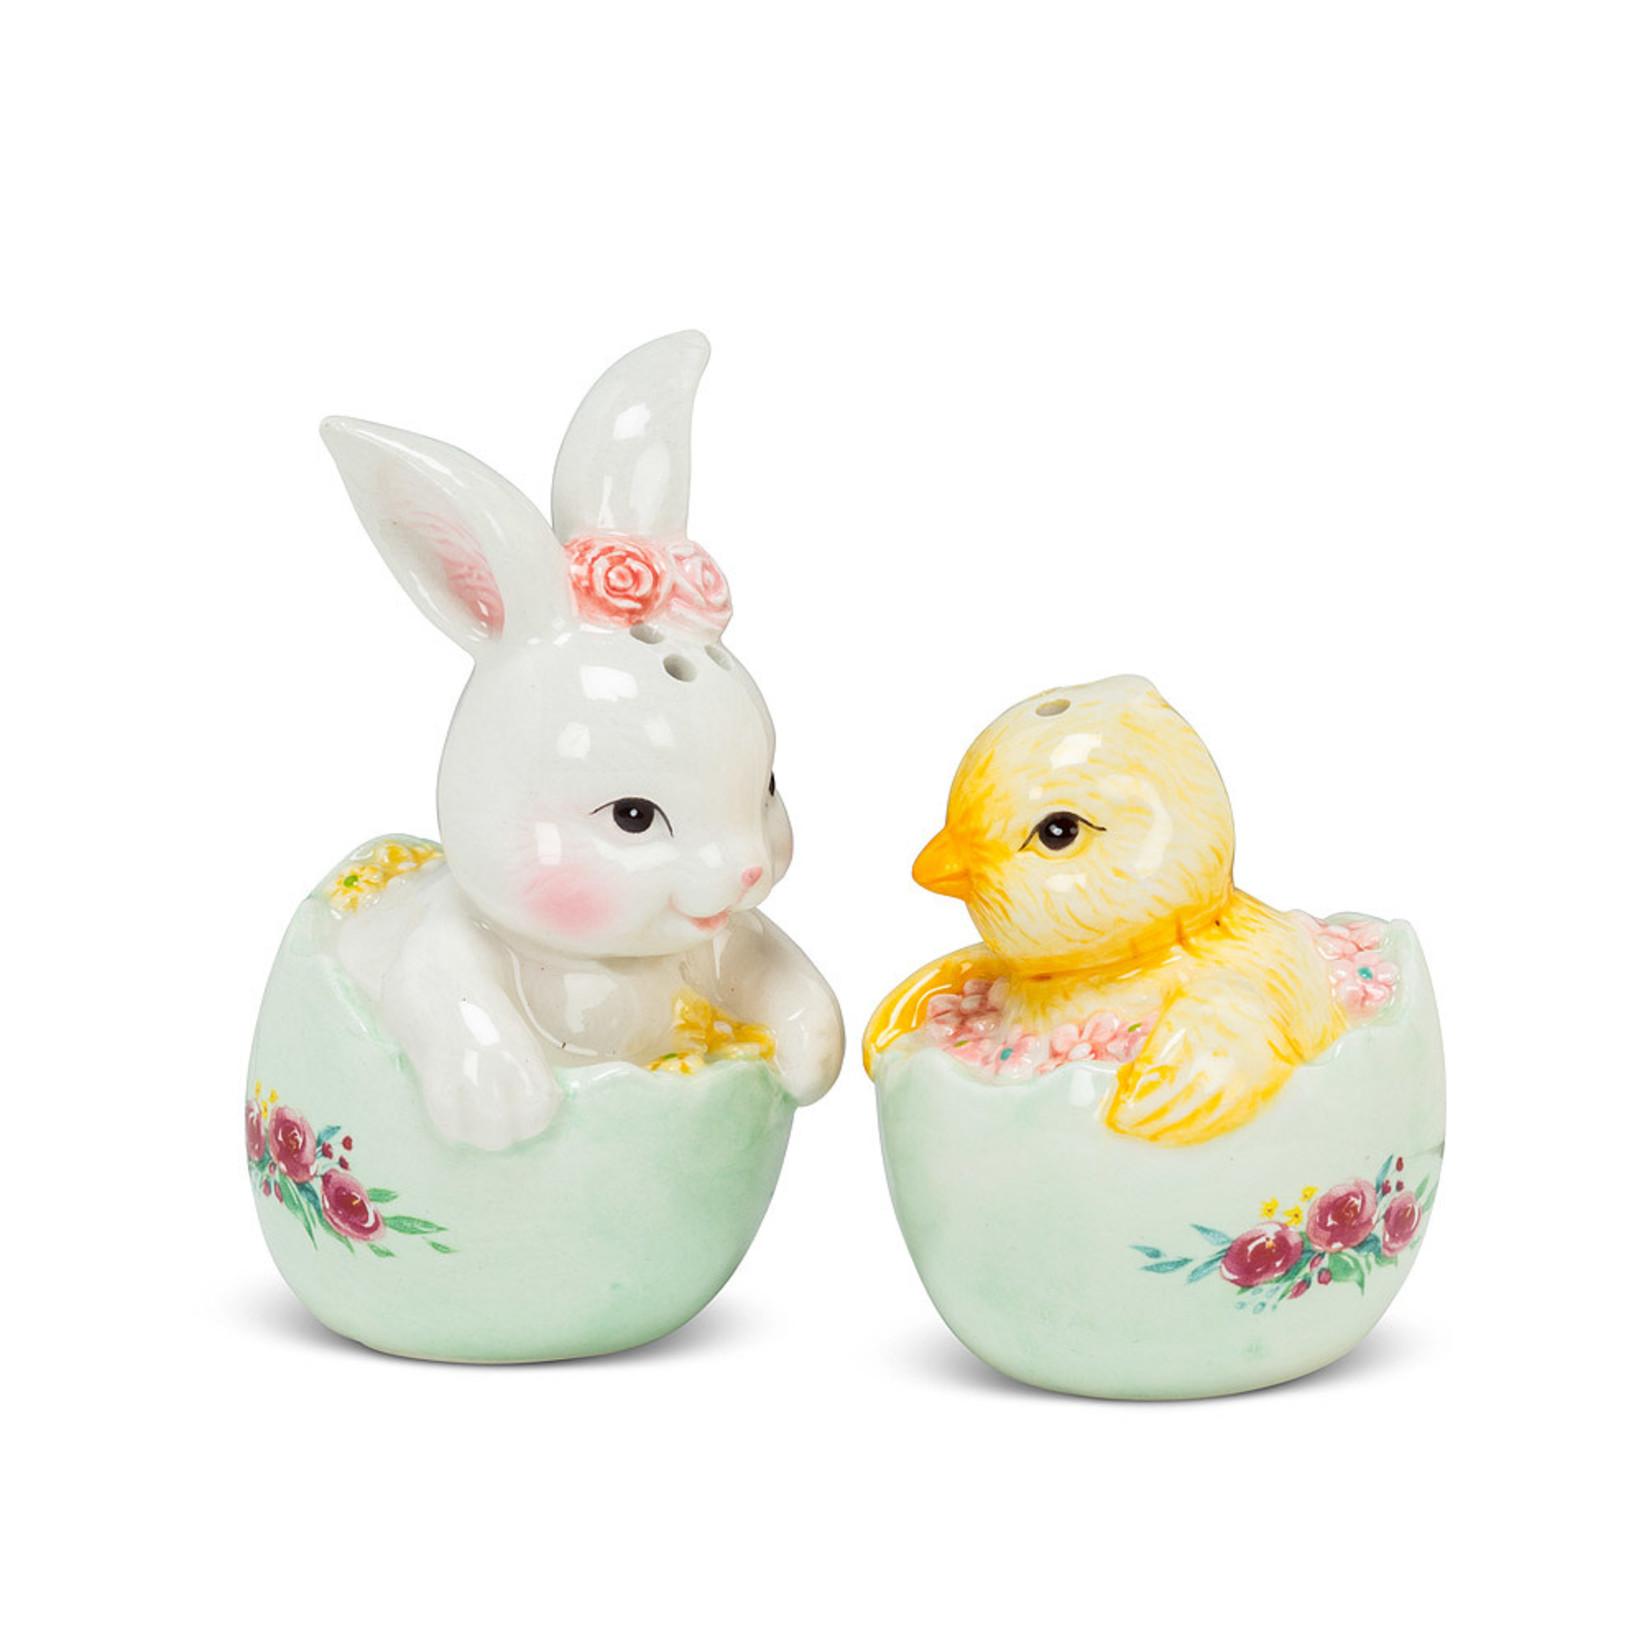 Rabbit & Chick S&P - Set